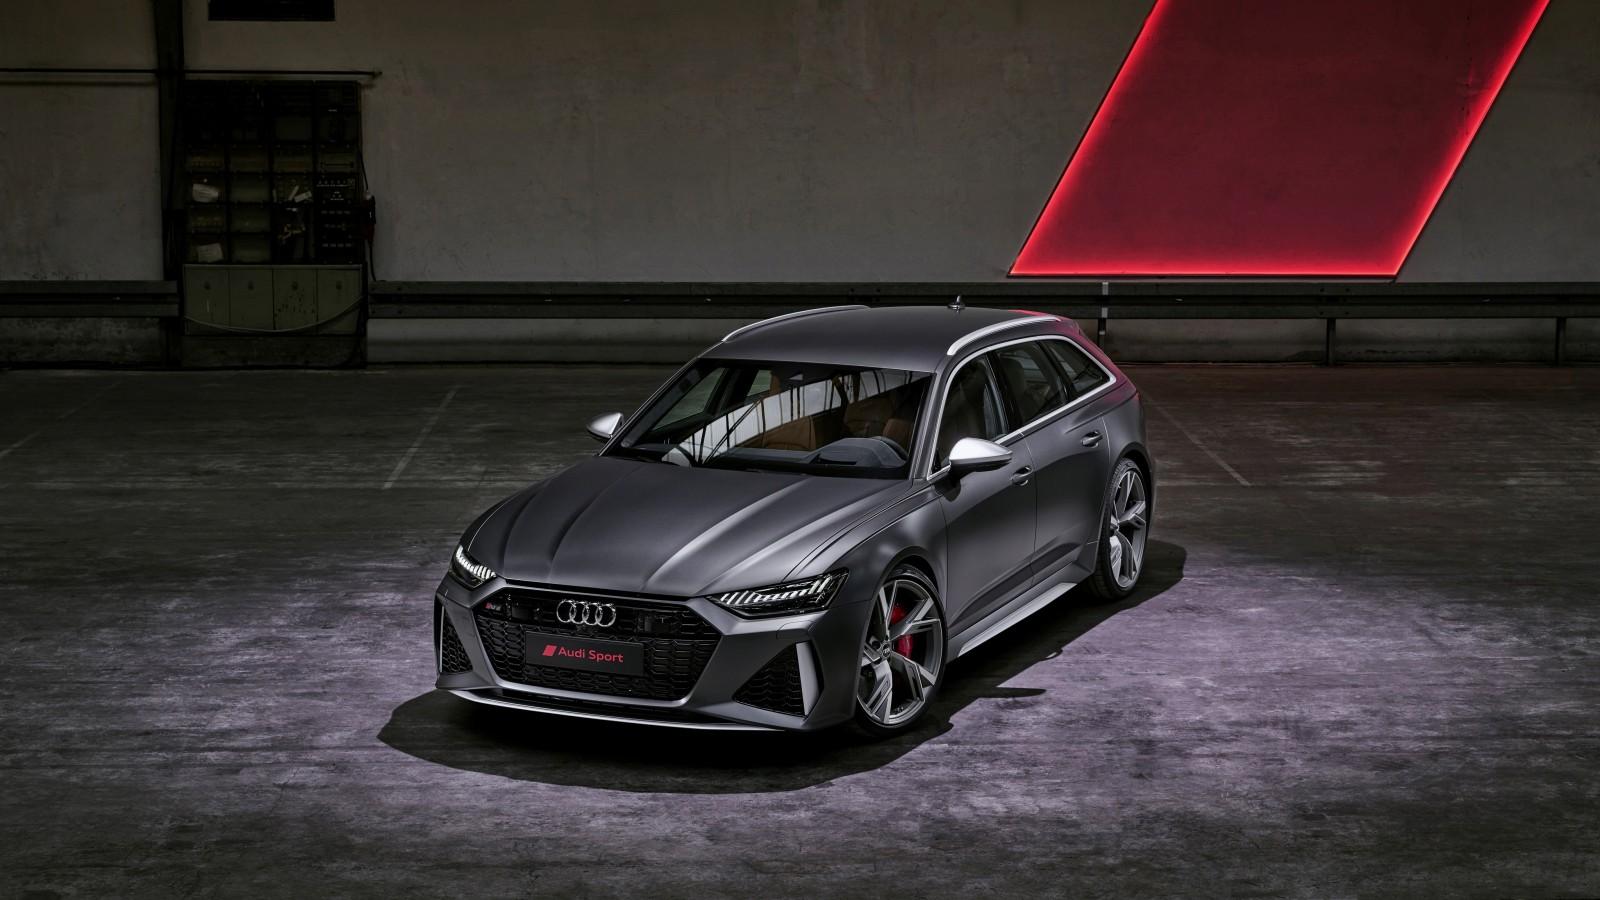 2020 Audi RS6 Avant 4K 3 Wallpaper | HD Car Wallpapers ...